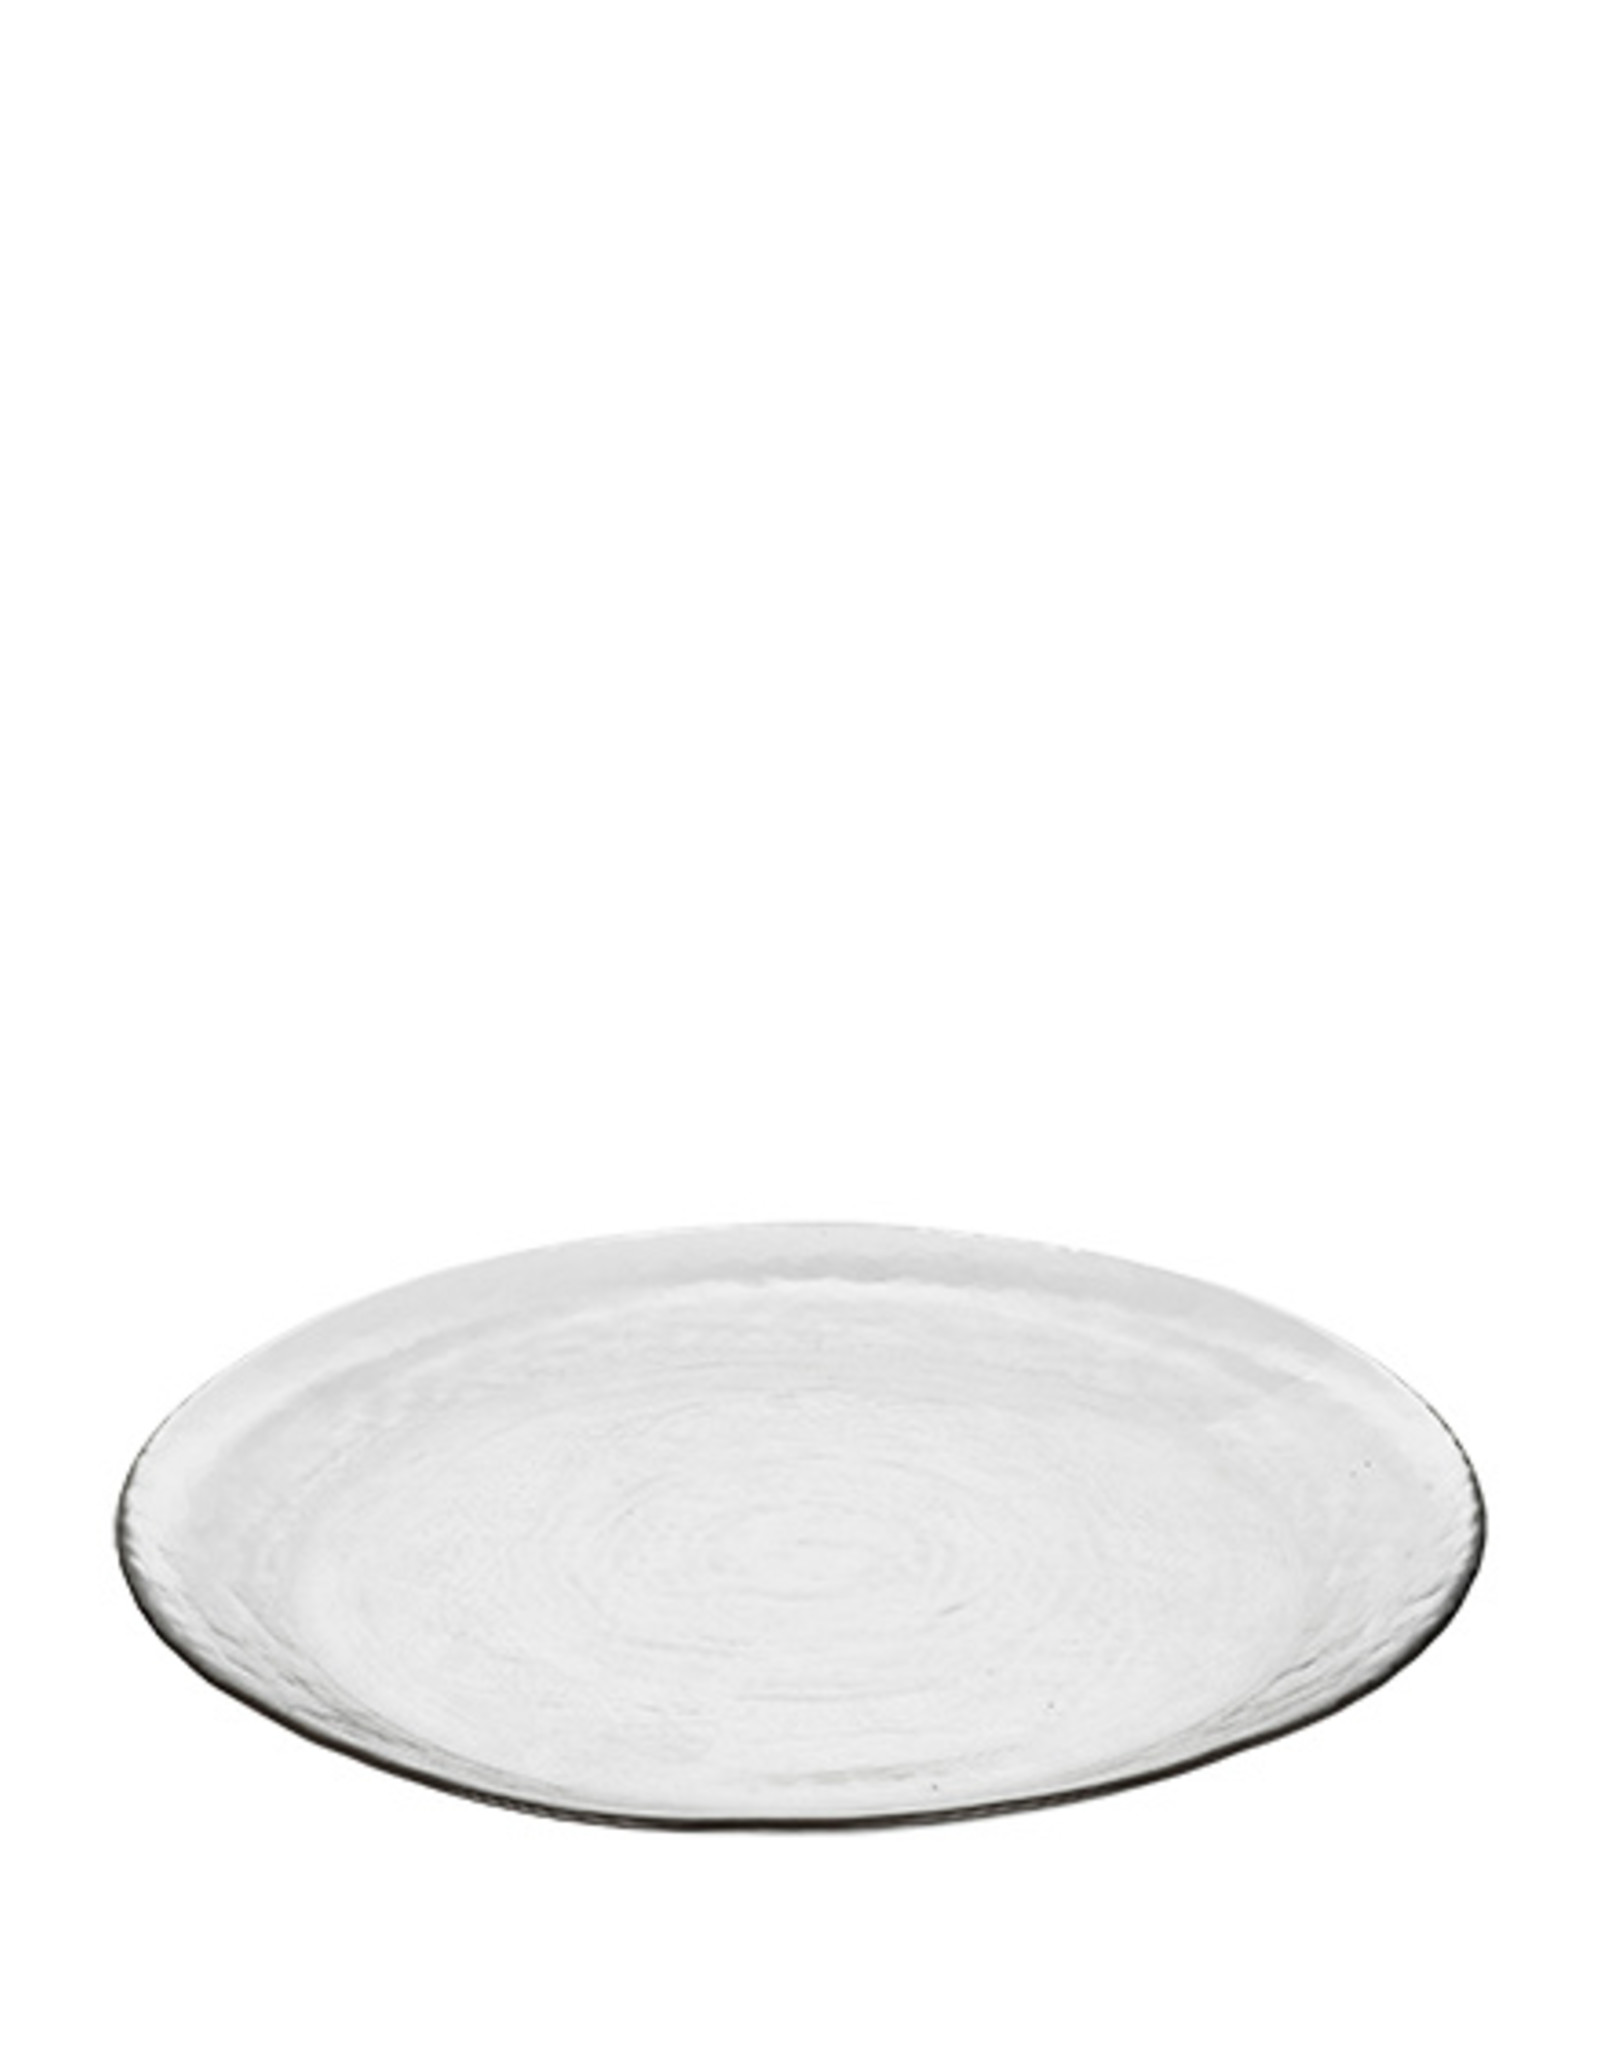 broste copenhagen Plate clear hammered glass